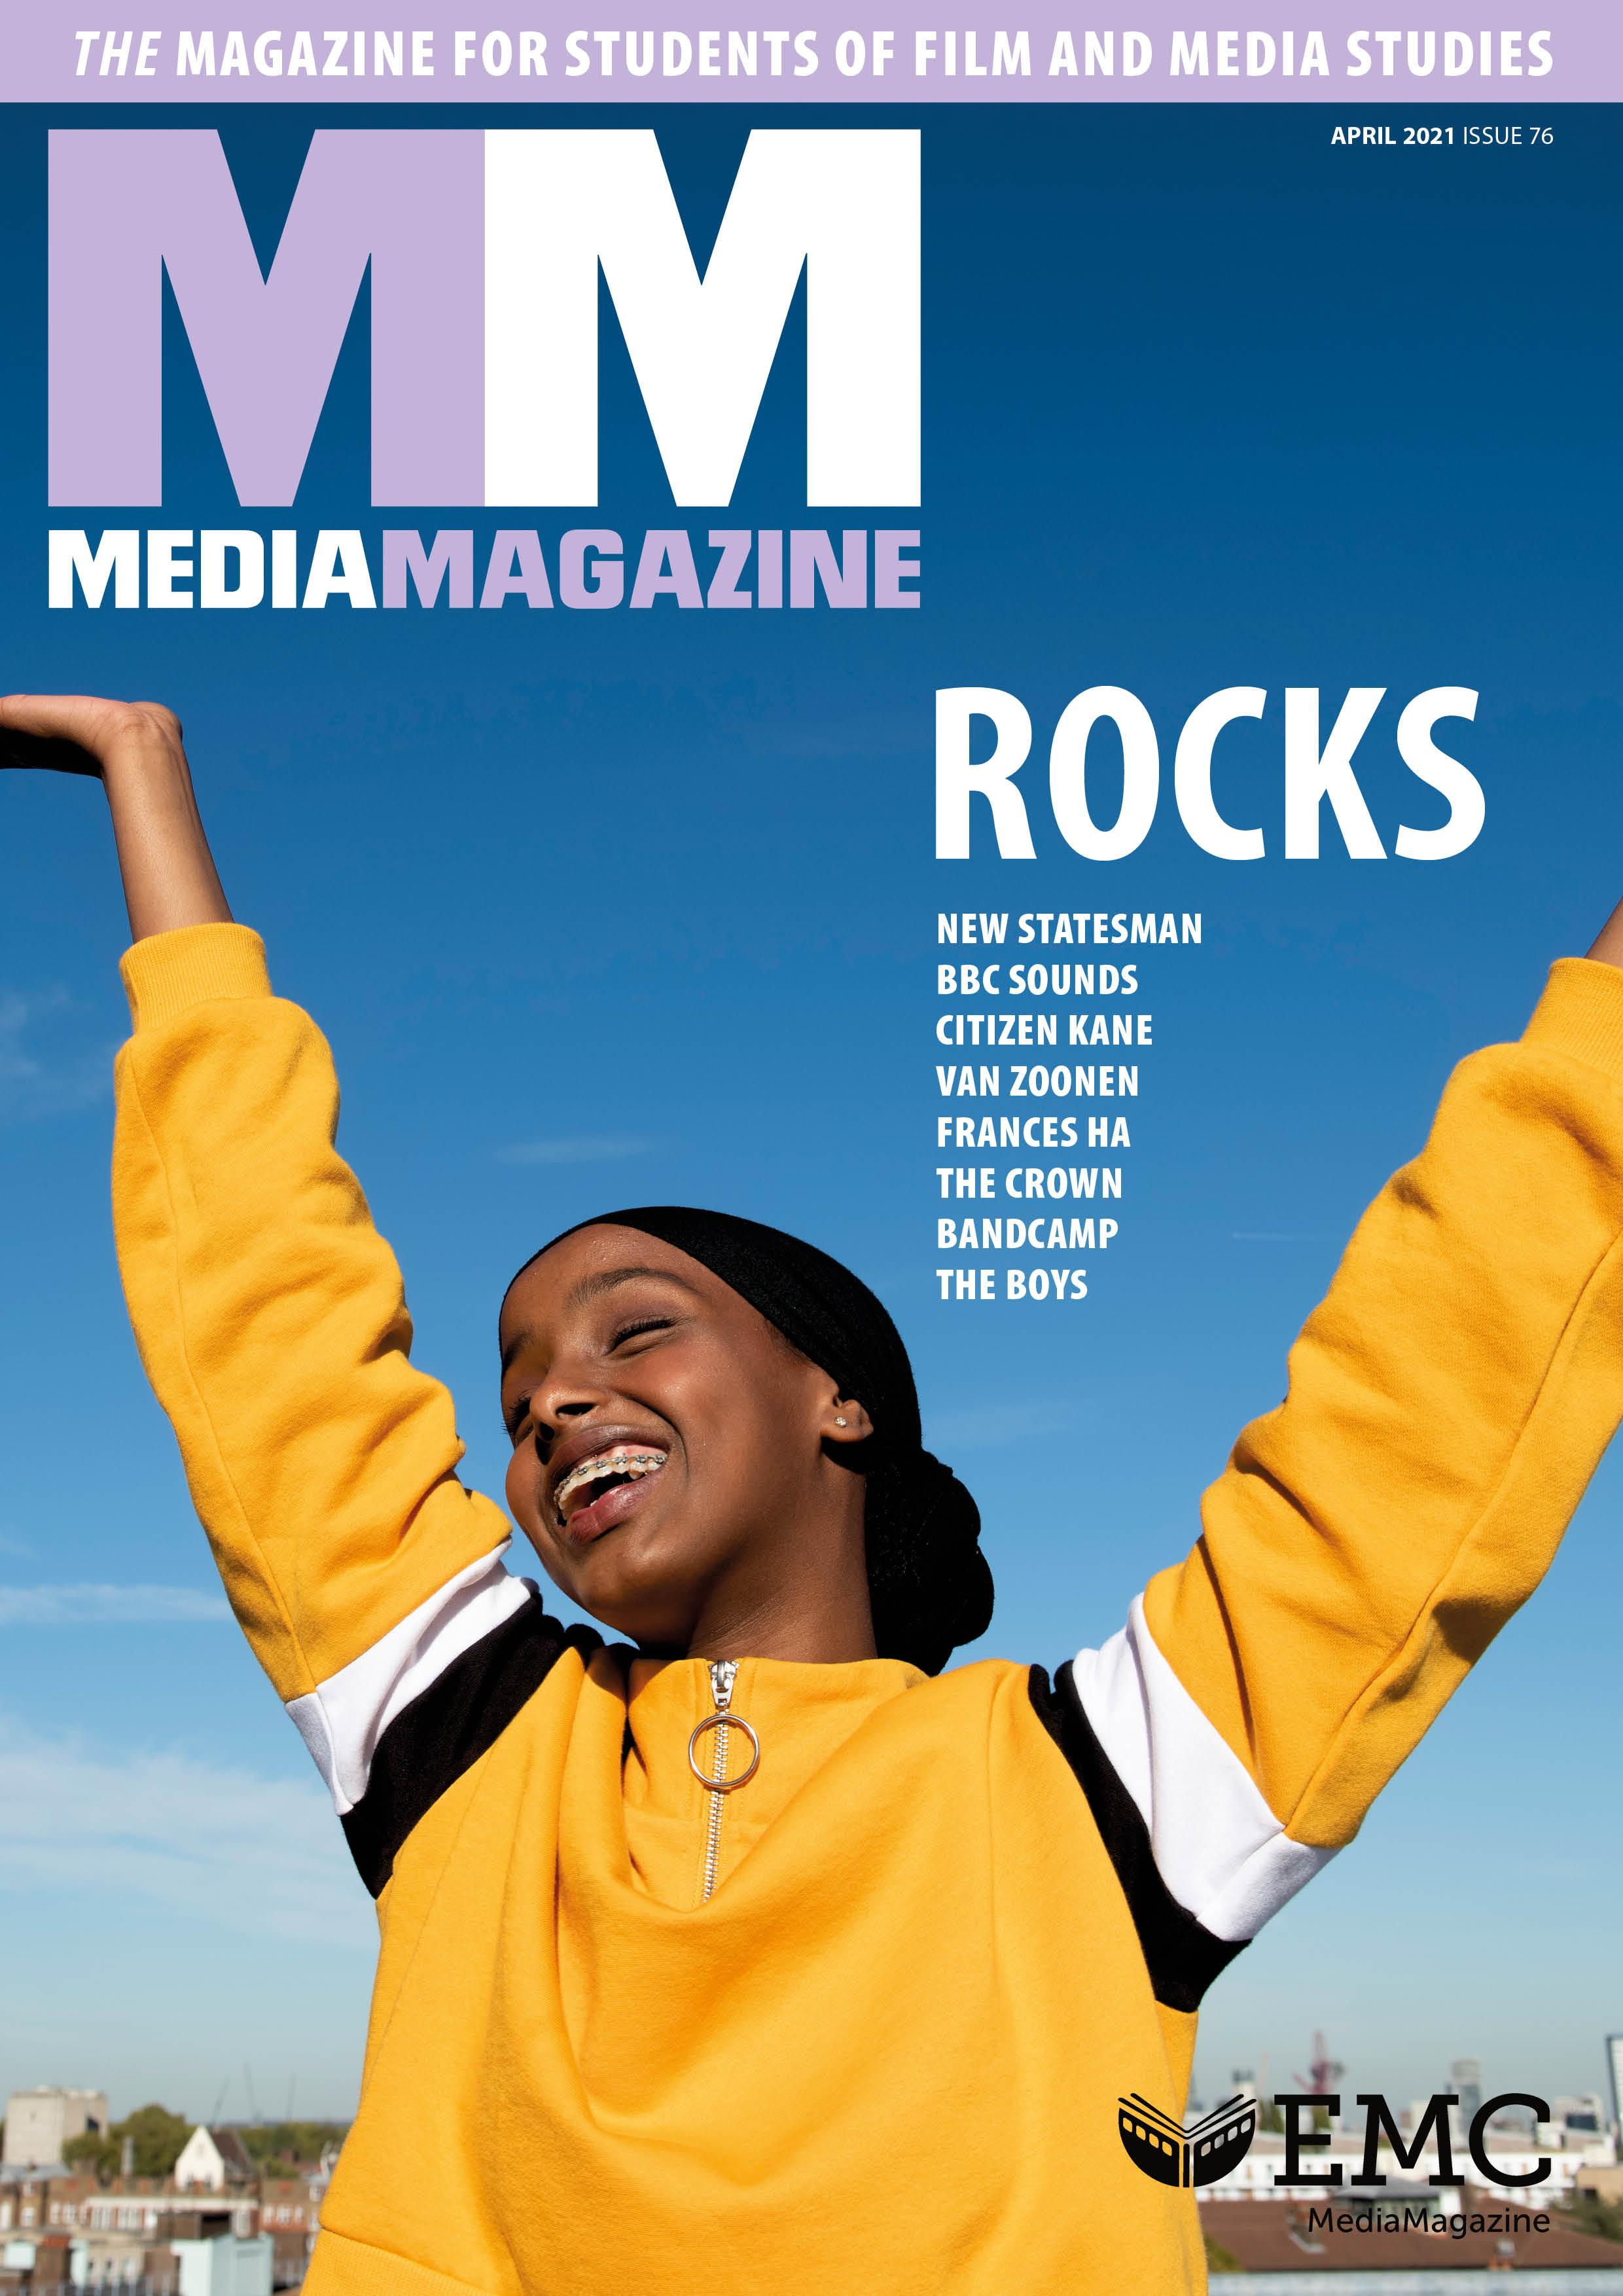 MediaMagazine 76 front cover